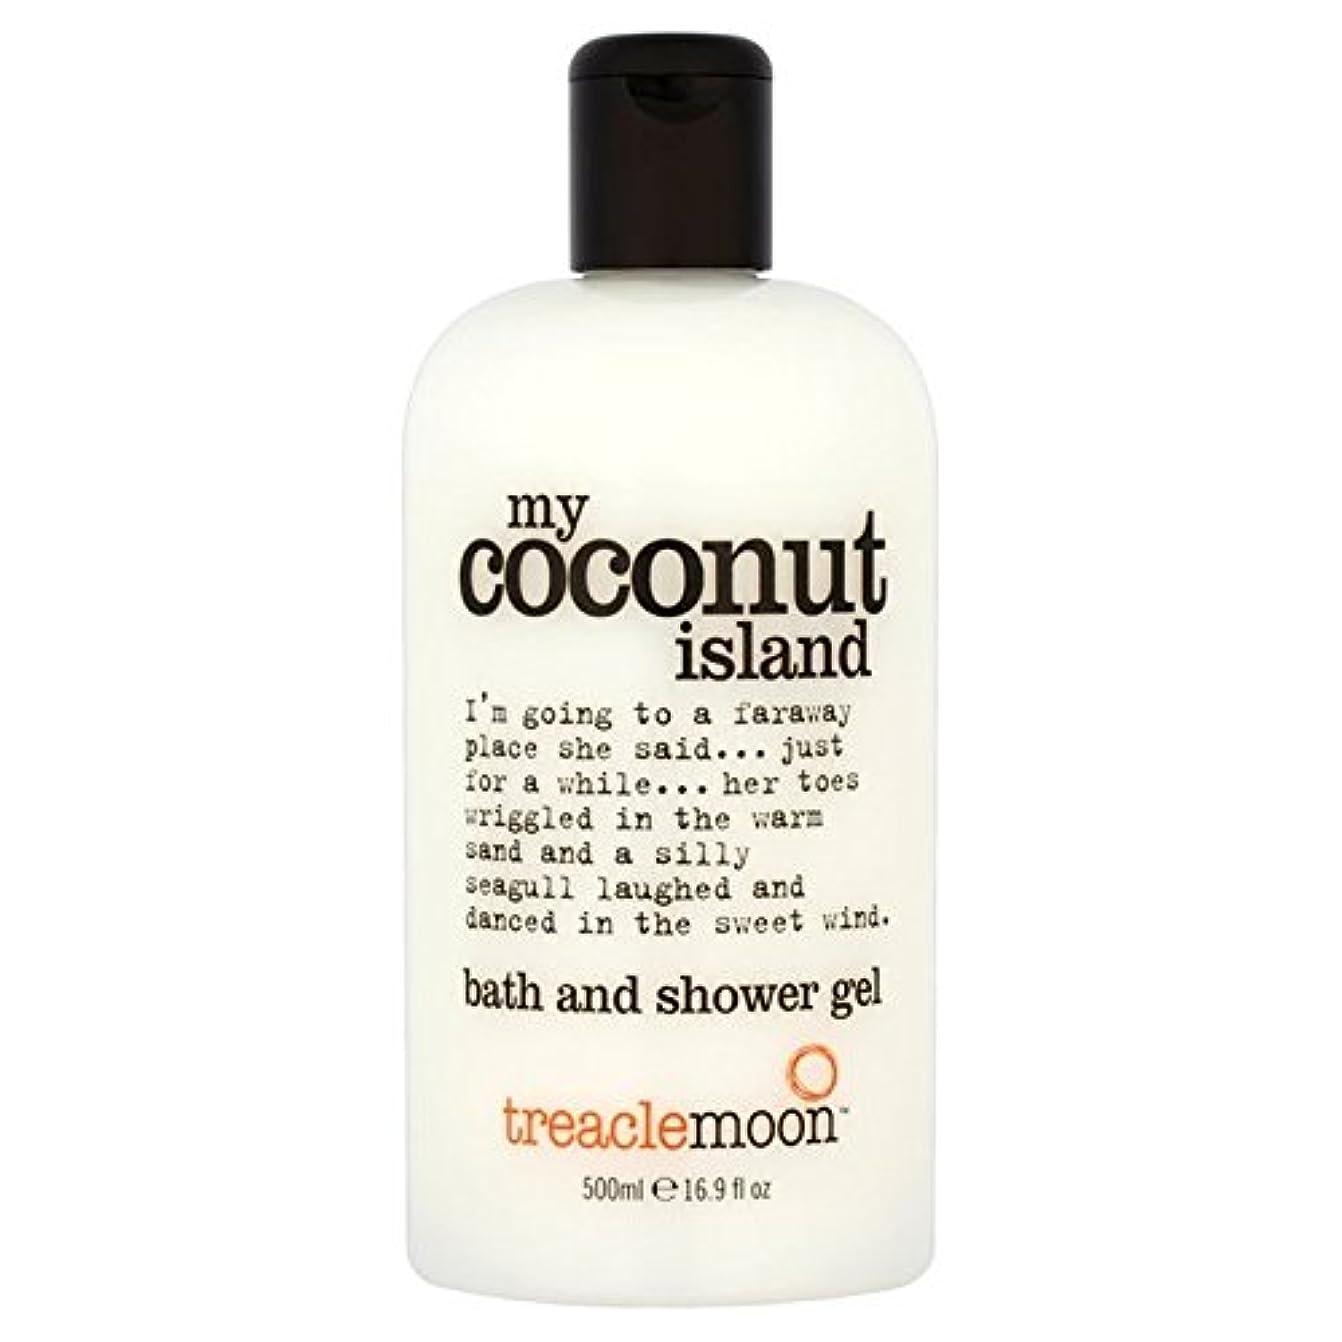 Treacle Moon Coconut Island Bath & Shower Gel 500ml - 糖蜜月ココナッツ島のバス&シャワージェル500ミリリットル [並行輸入品]